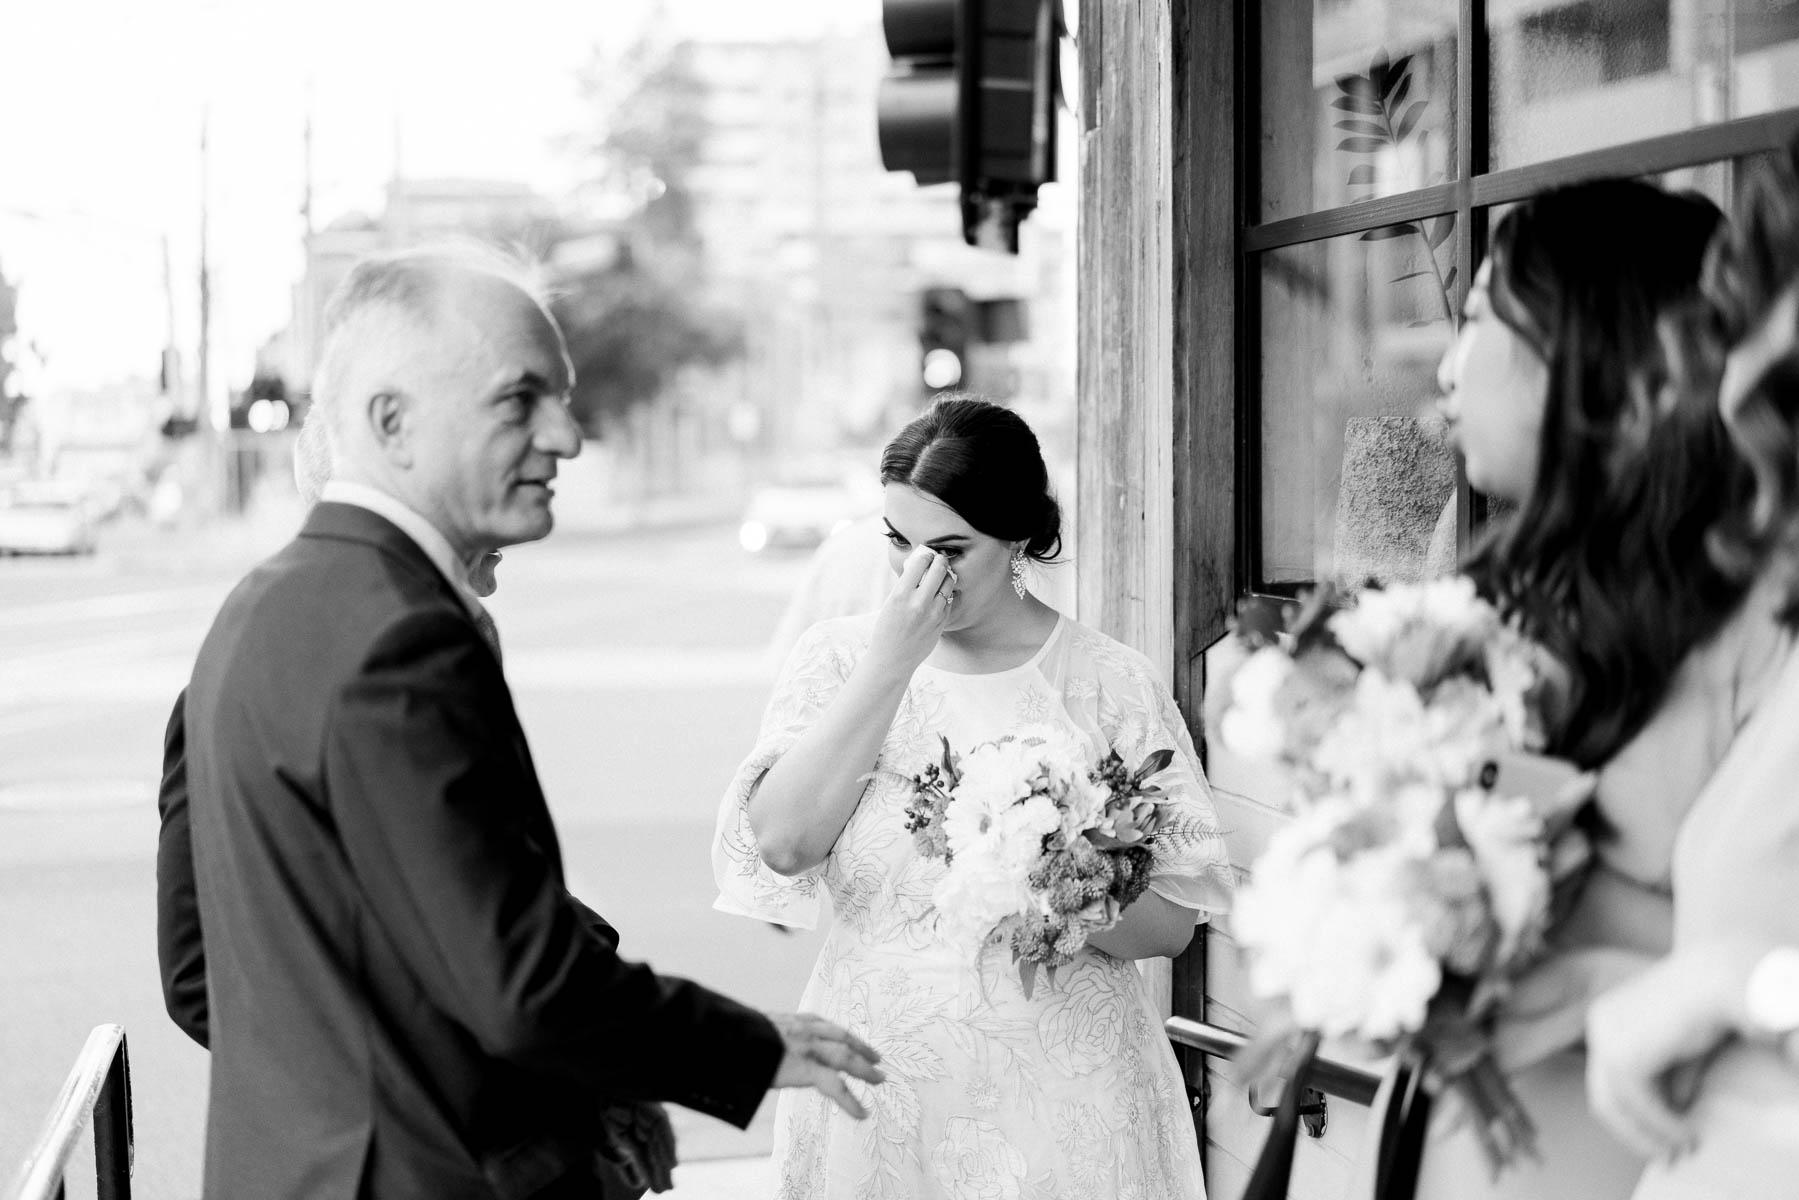 little-henri-cafe-wedding-thornbury-heart+soul-weddings-jane-aaron-05580.jpg